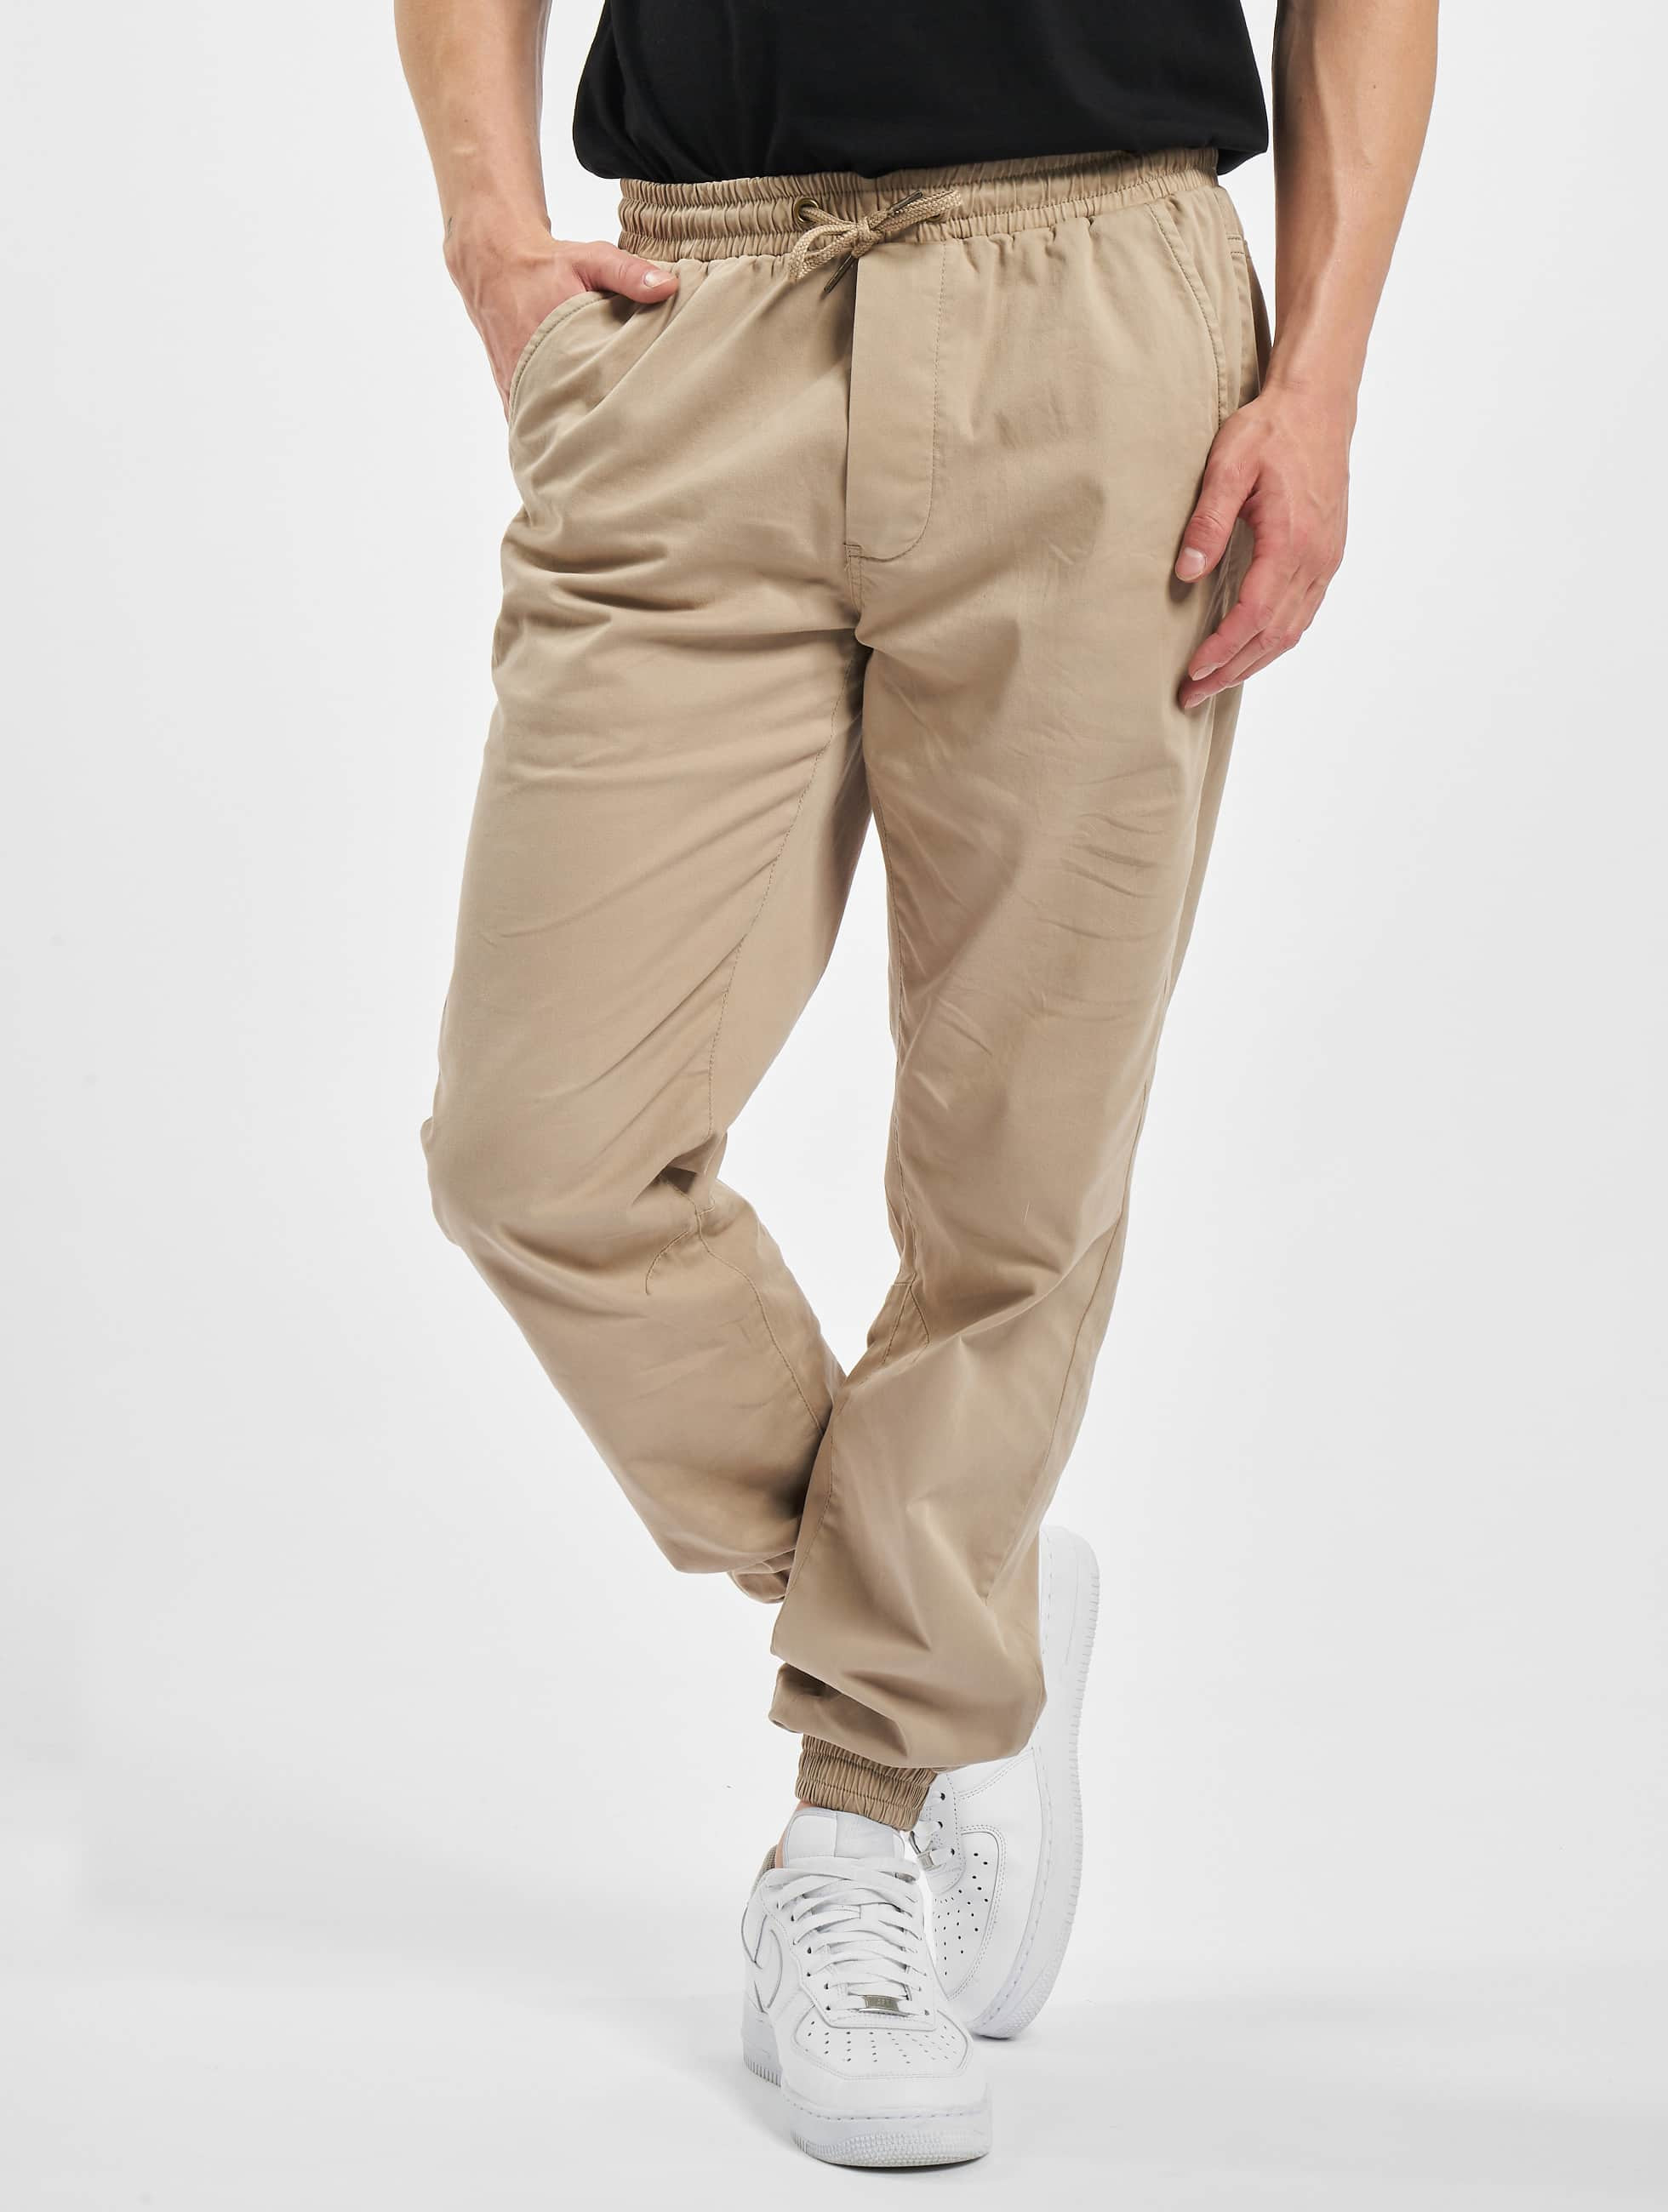 Urban Classics Jogginghose Stretch Twill beige